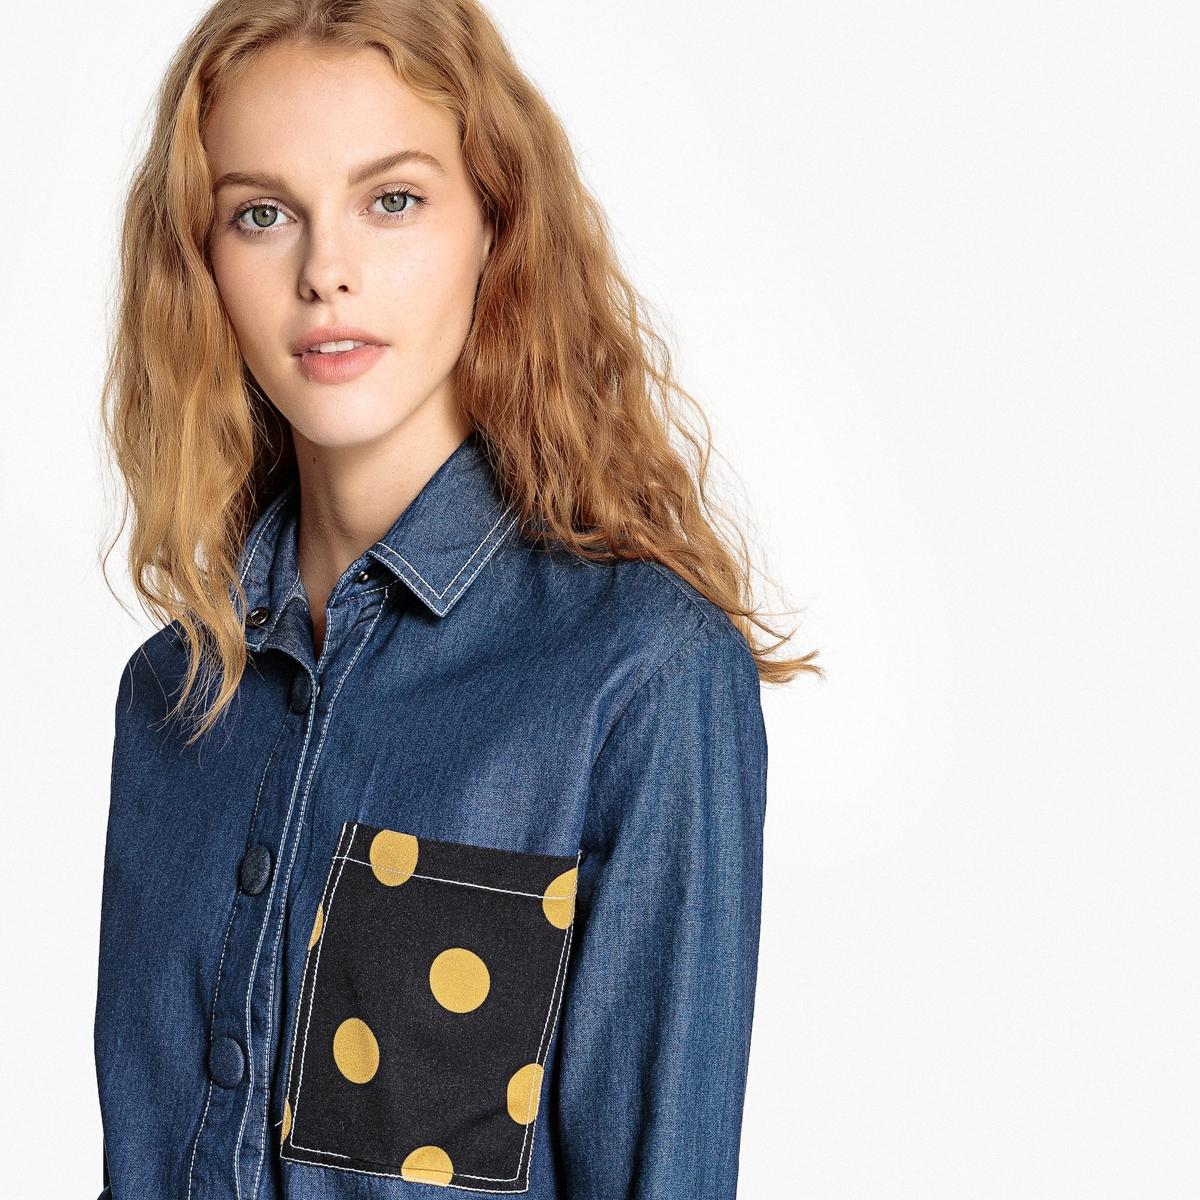 Рубашка LaRedoute Короткая из денима с карманом рисунком в горошек 36 (FR) - 42 (RUS) синий